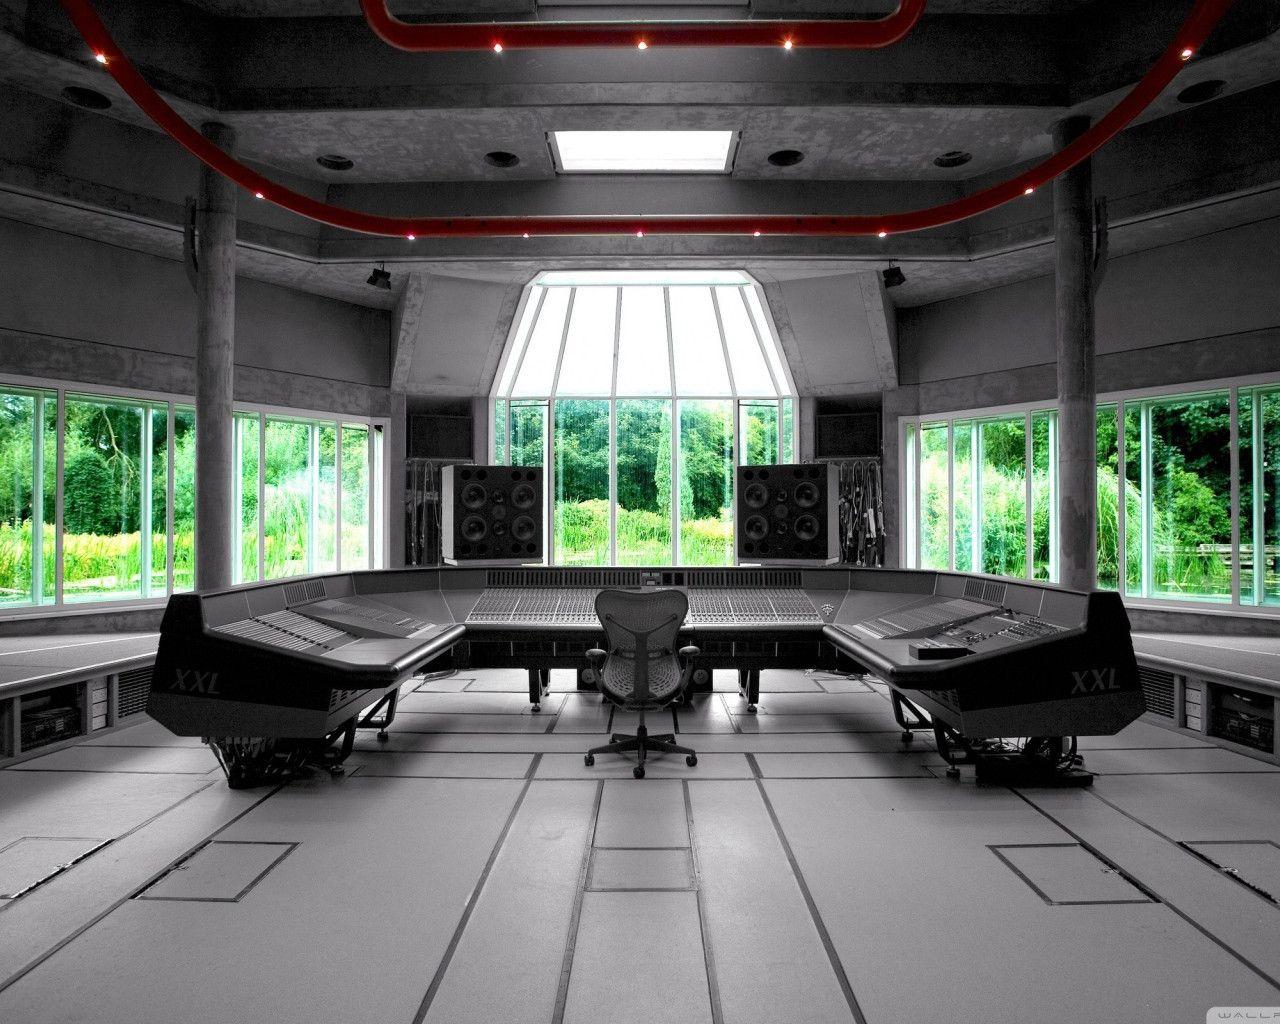 Shipping container music studio joy studio design gallery best - Recording Studio Or Death Star Control Center Hmmmm